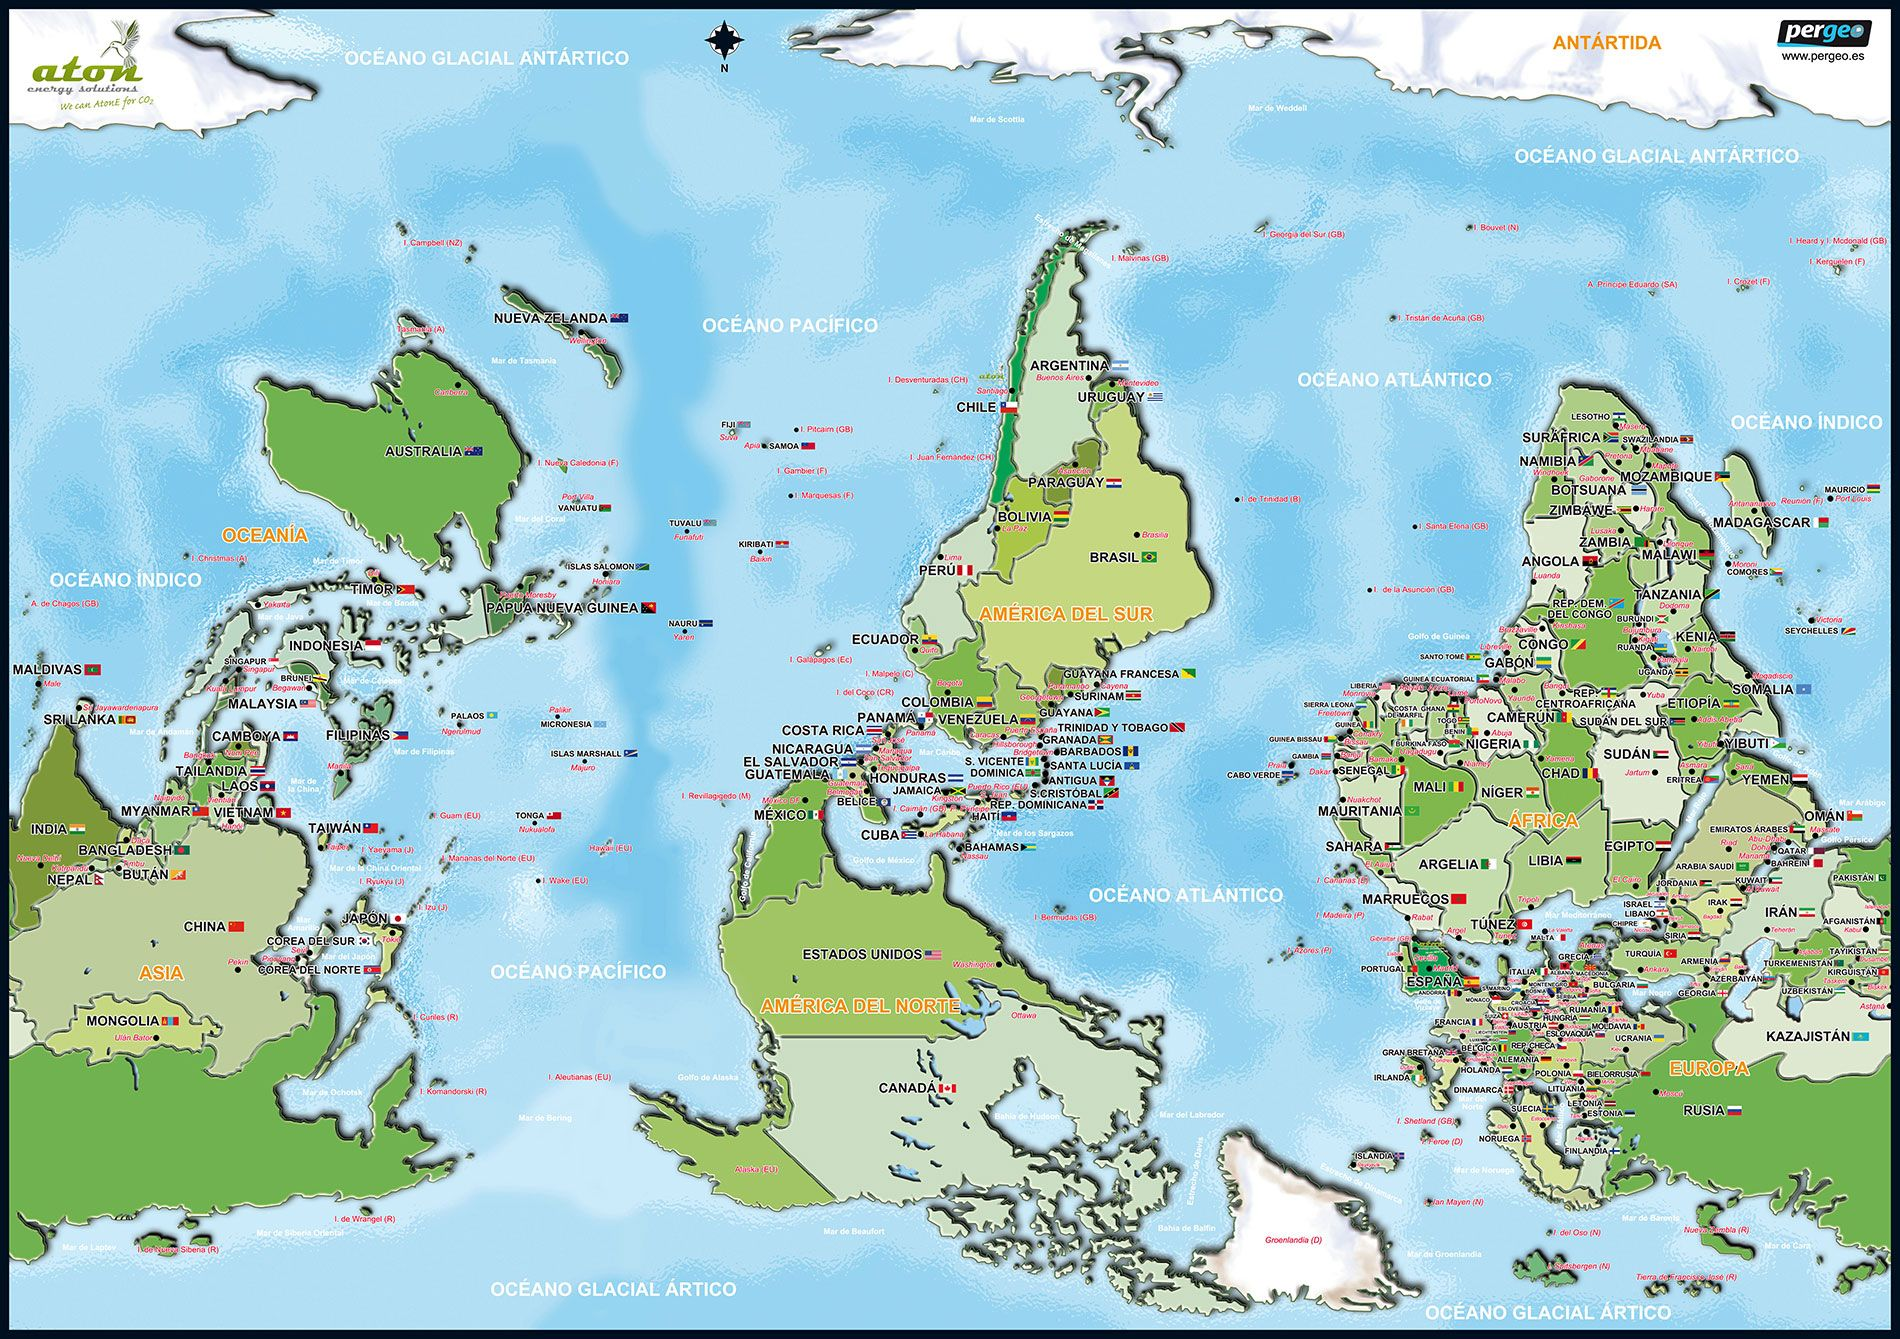 mapamundiatonjpg 19001339  cartografias  Pinterest